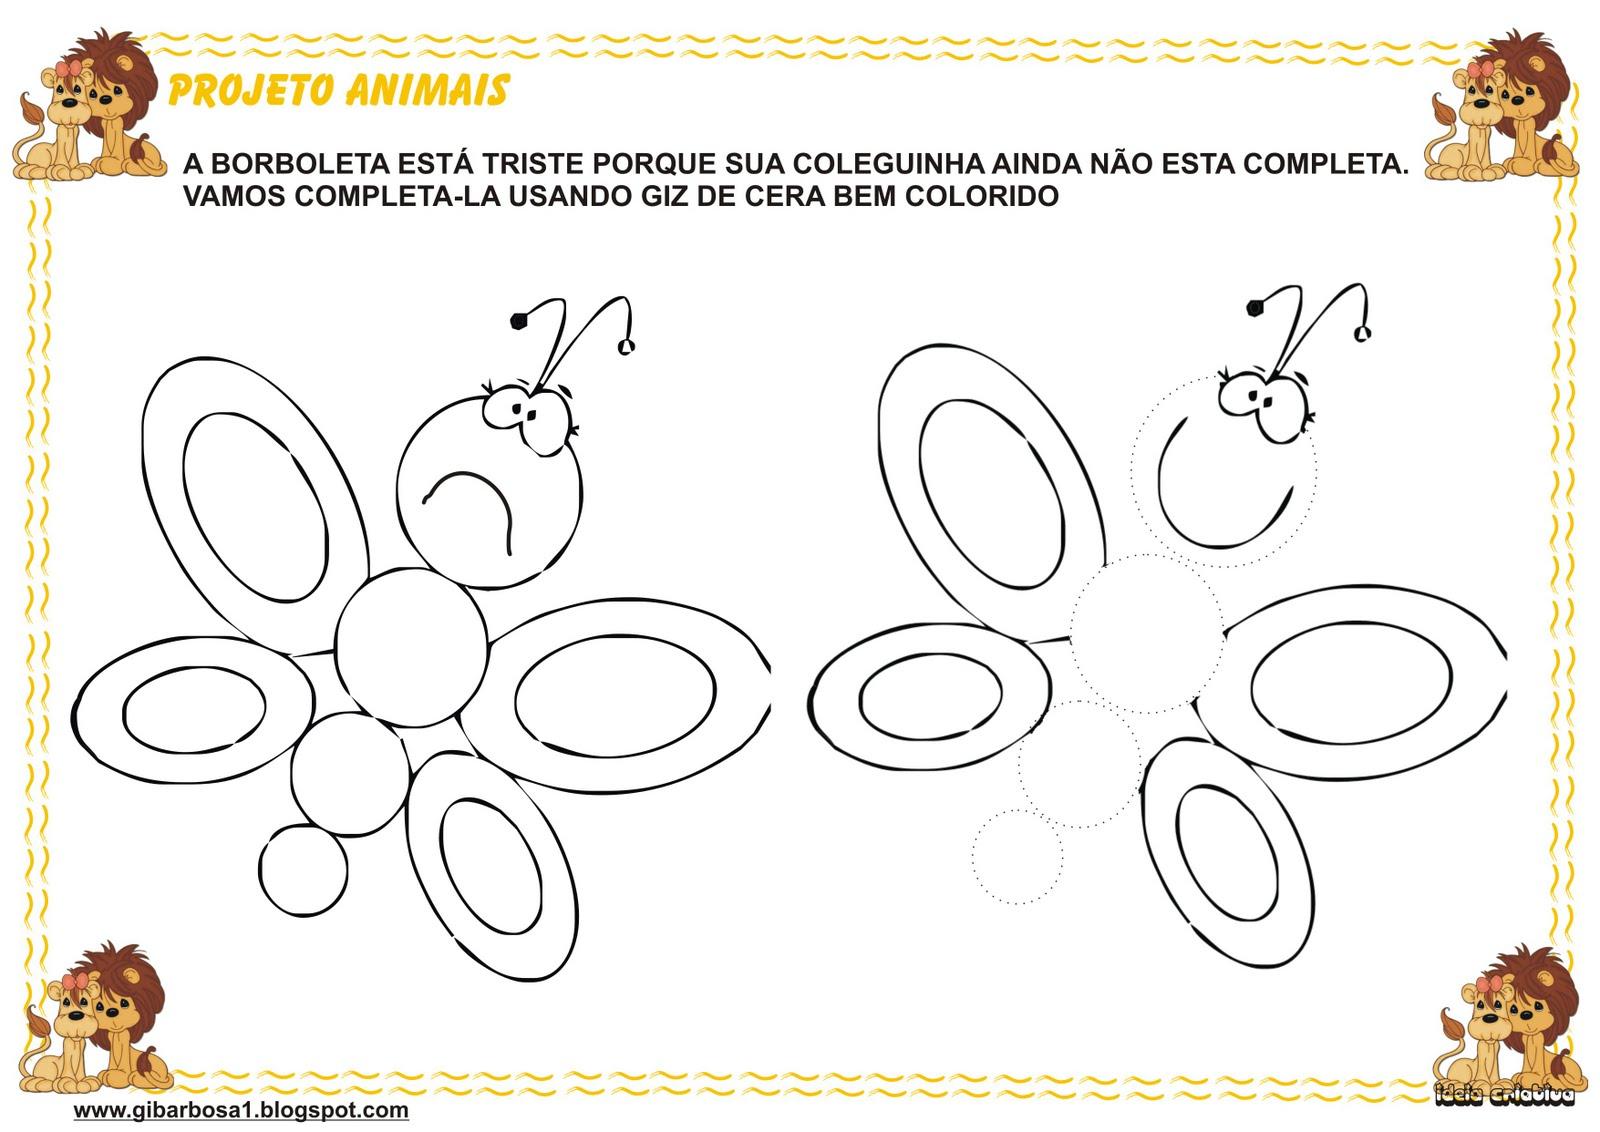 Atividade Maternal Projeto Animais Versos A borboleta